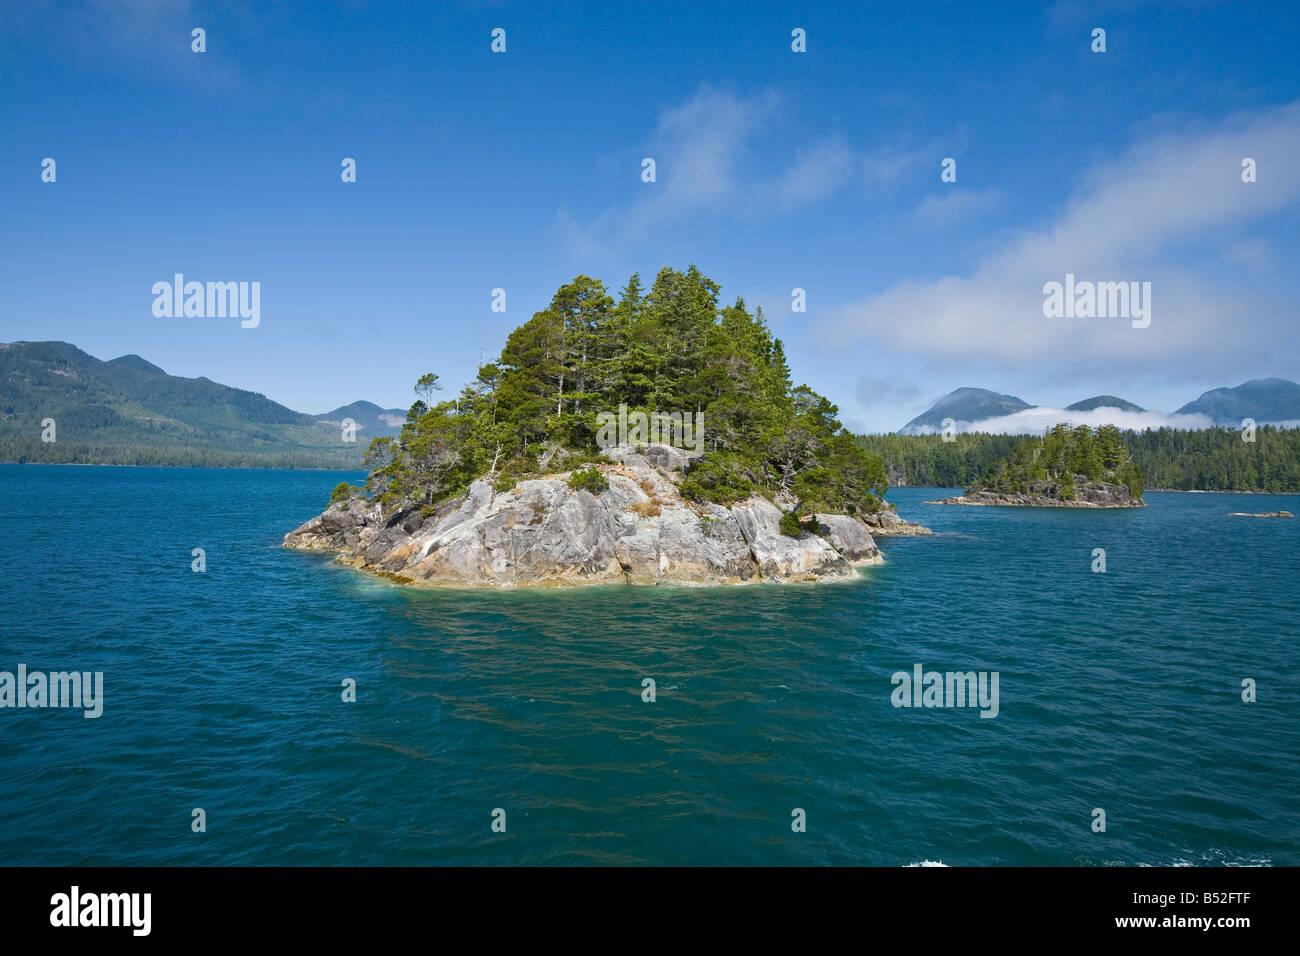 Crociera Uchuck Nootka Vancouver Island British Columbia Canada Immagini Stock